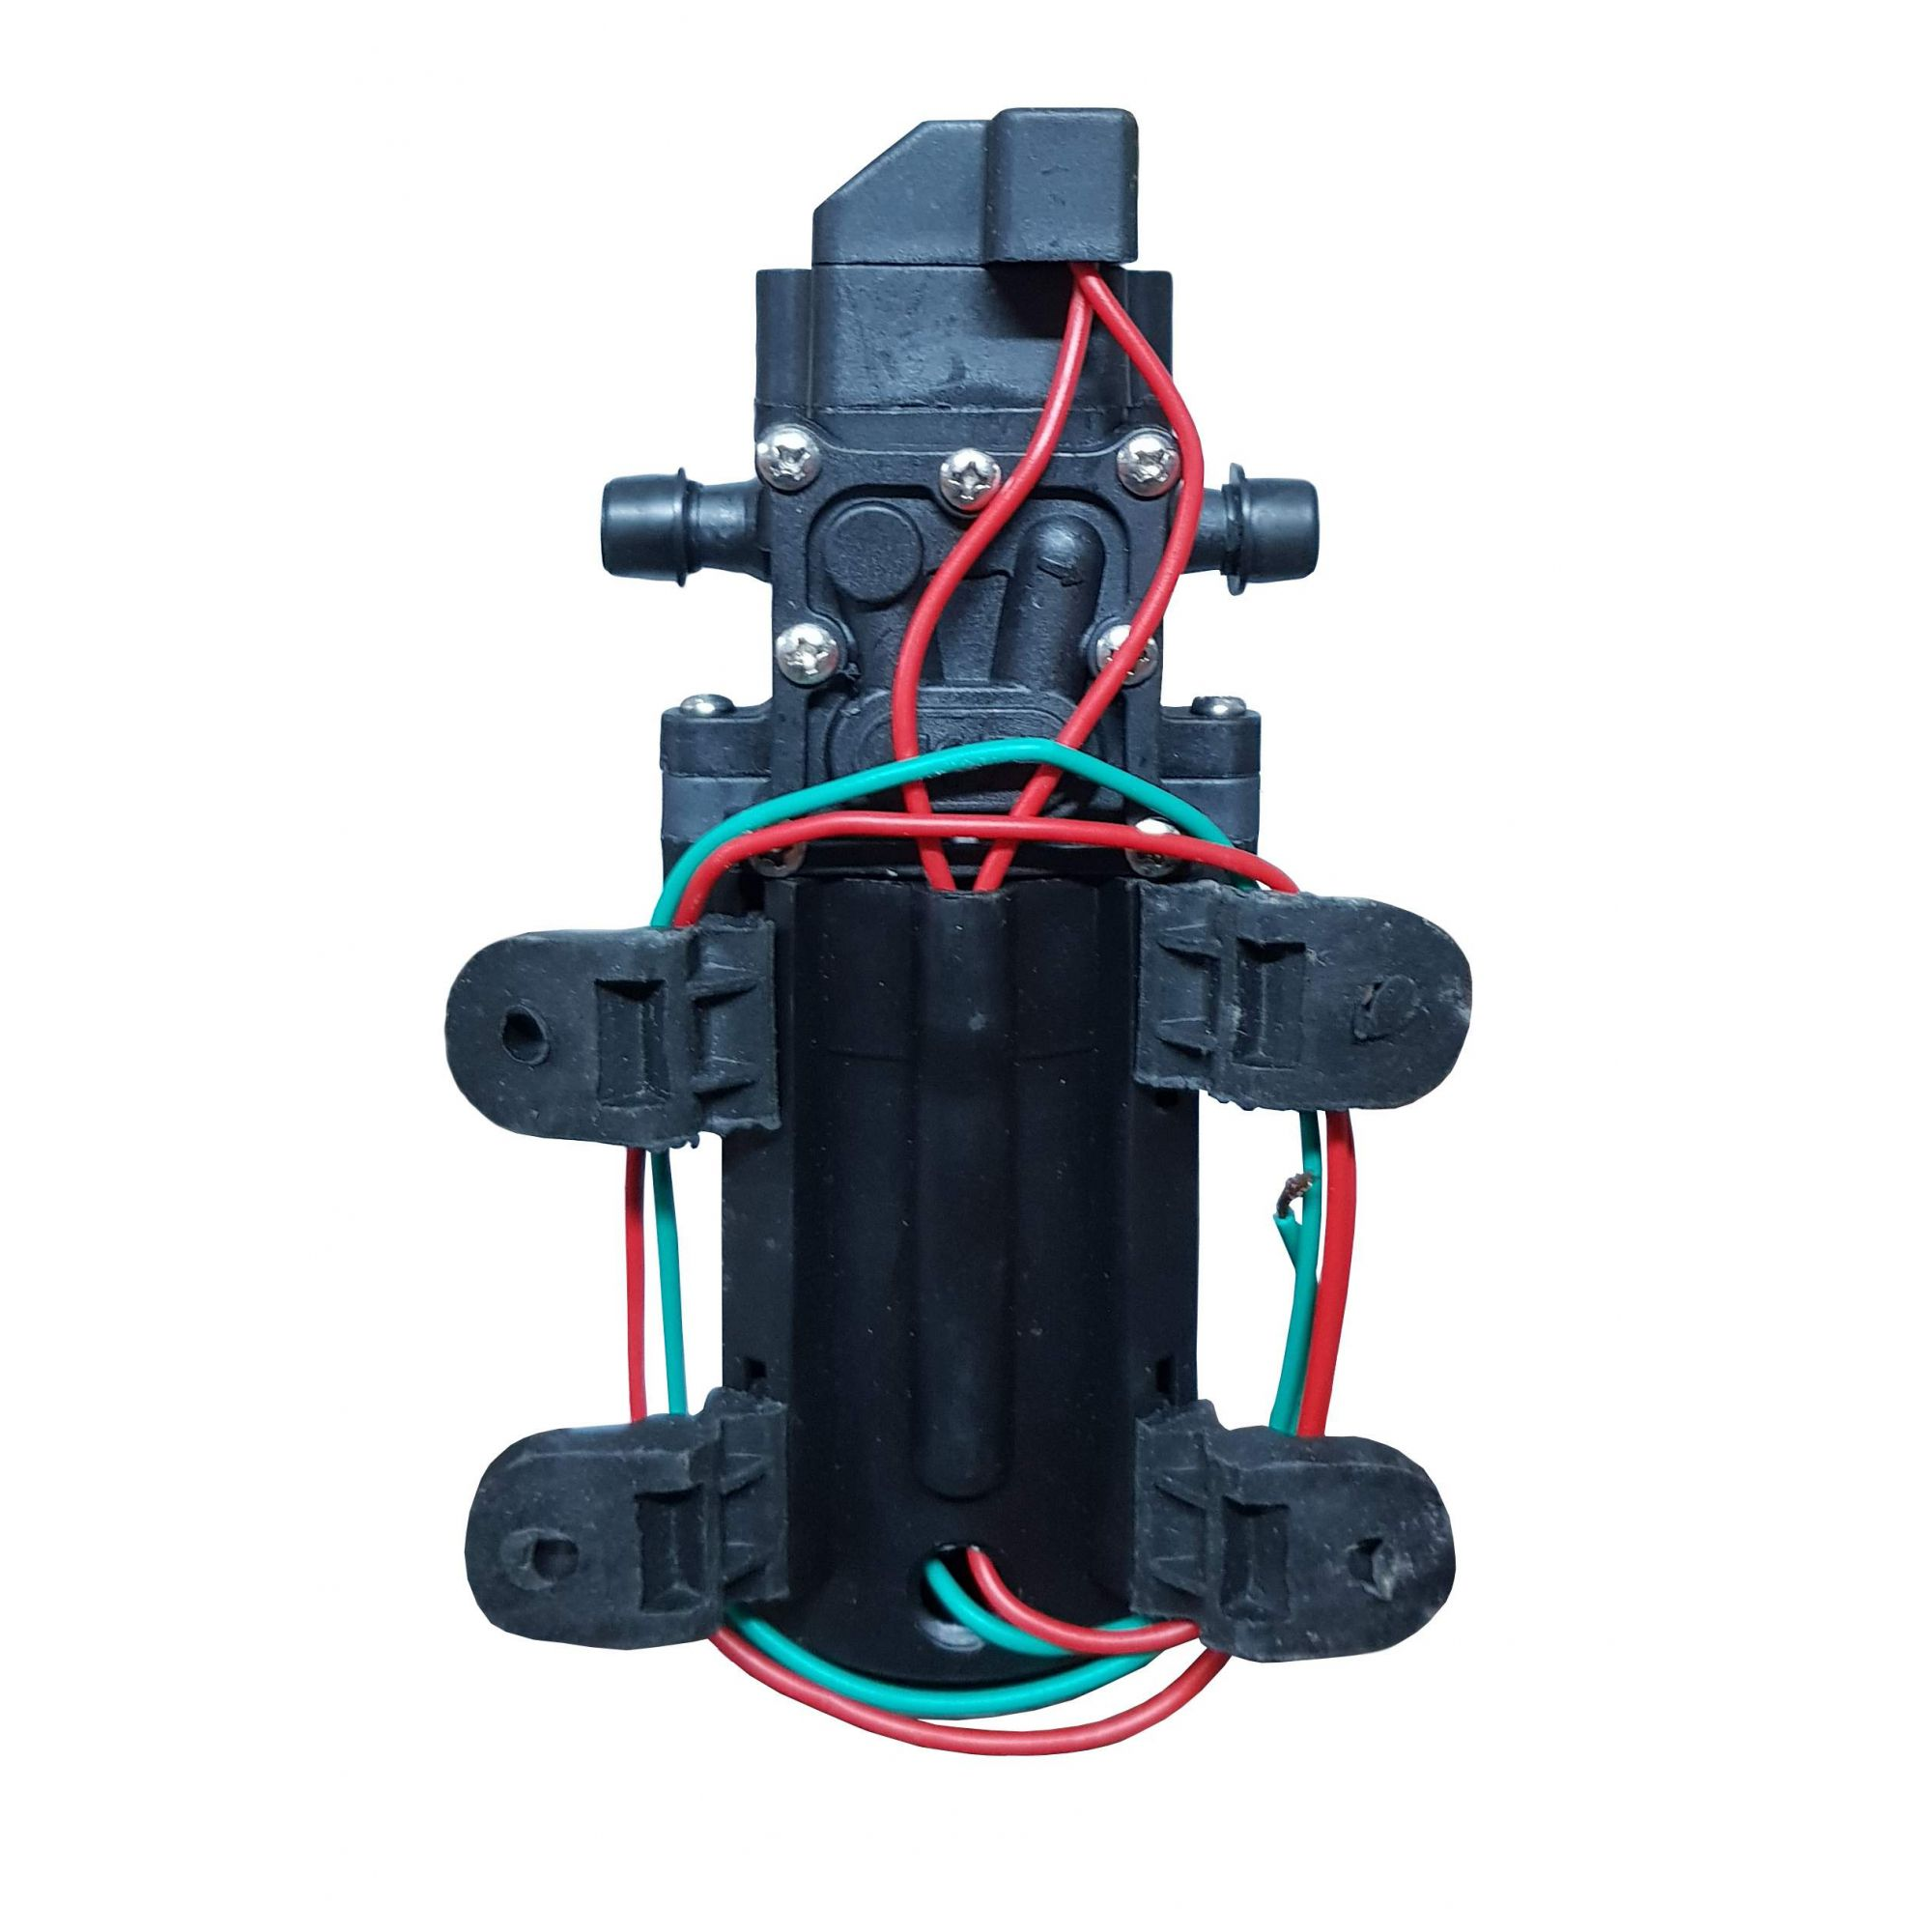 Bomba Pressurizadora para Pulverizador 18 Litros Mundi